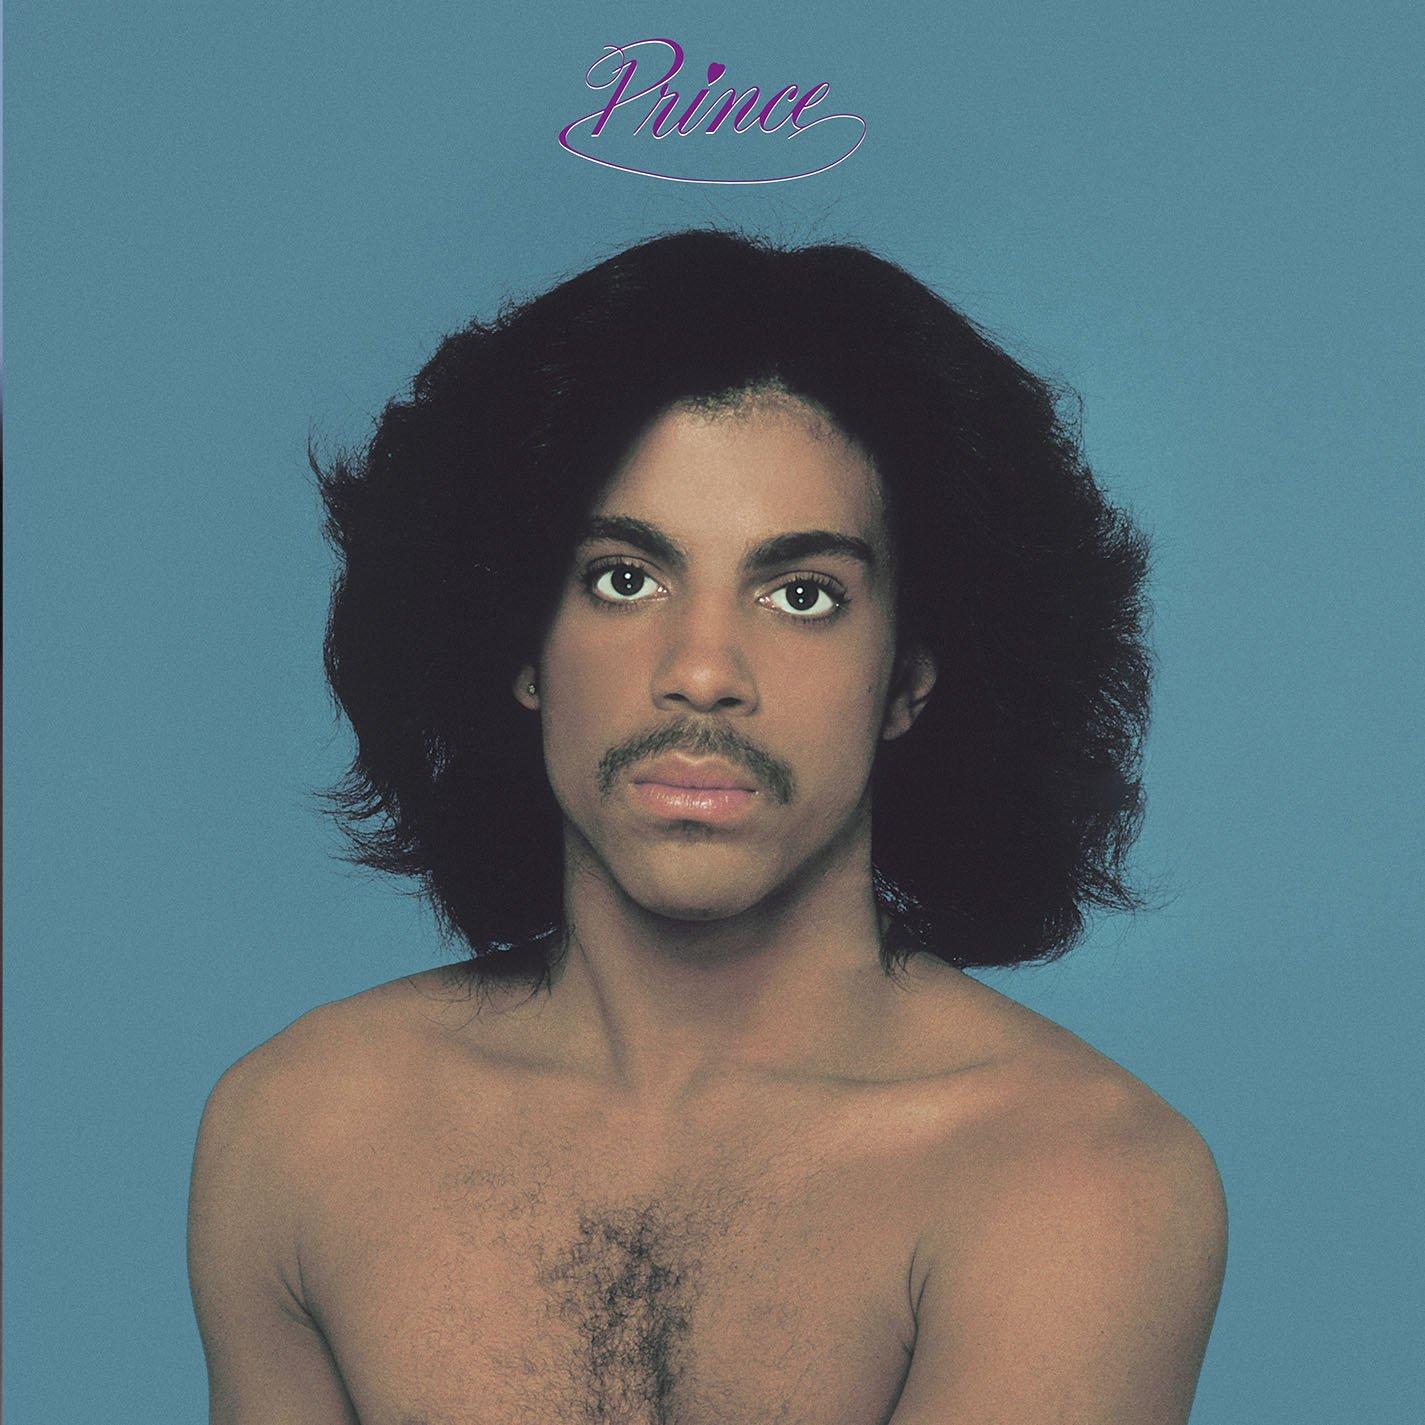 Prince - Prince (Vinyl) - Amazon.com Music